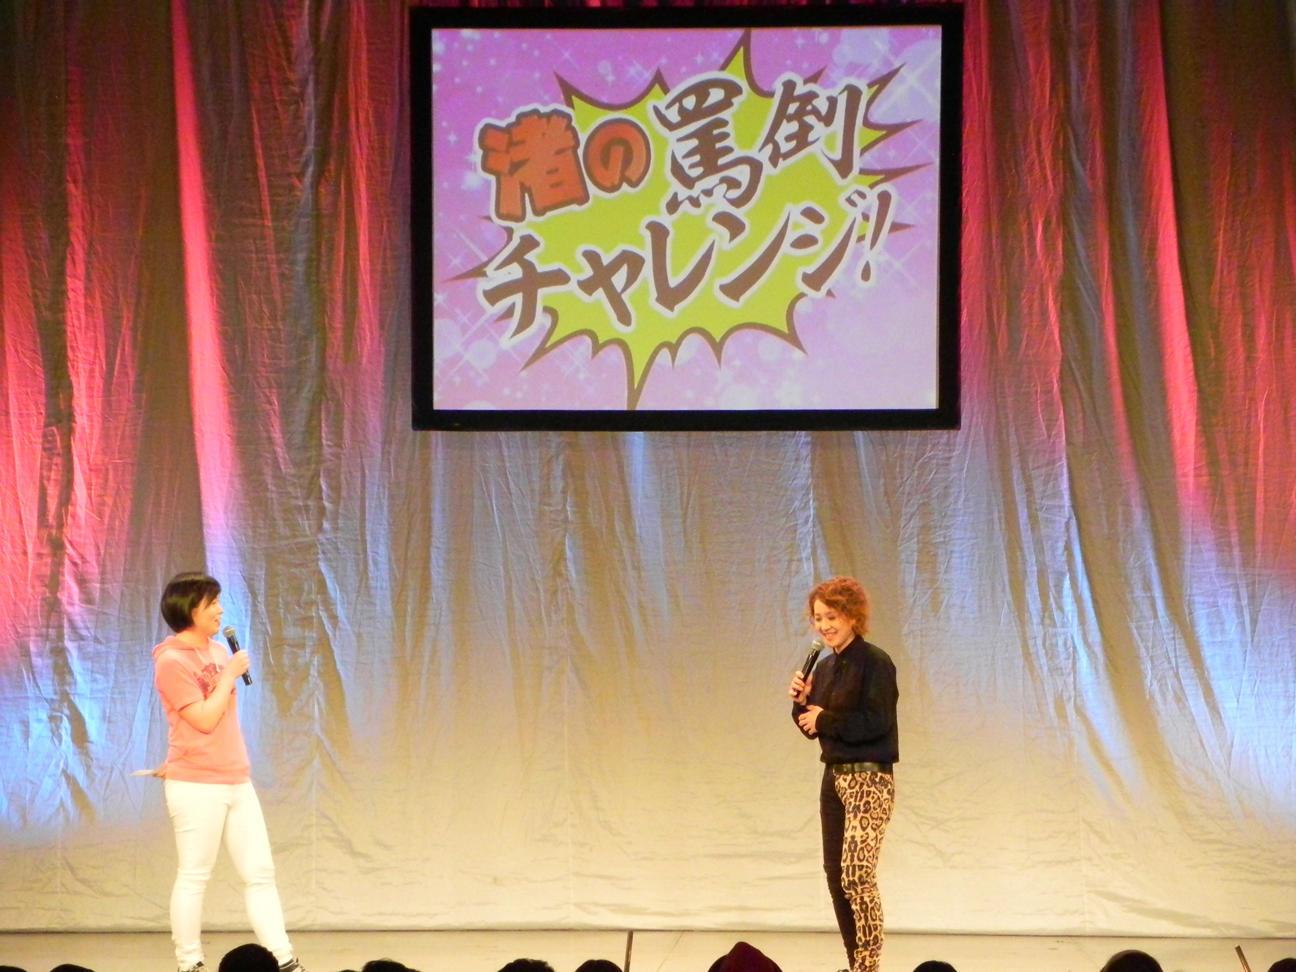 http://news.yoshimoto.co.jp/20170220215618-176765941886f63527c4783cc274200e7284edd2.jpg